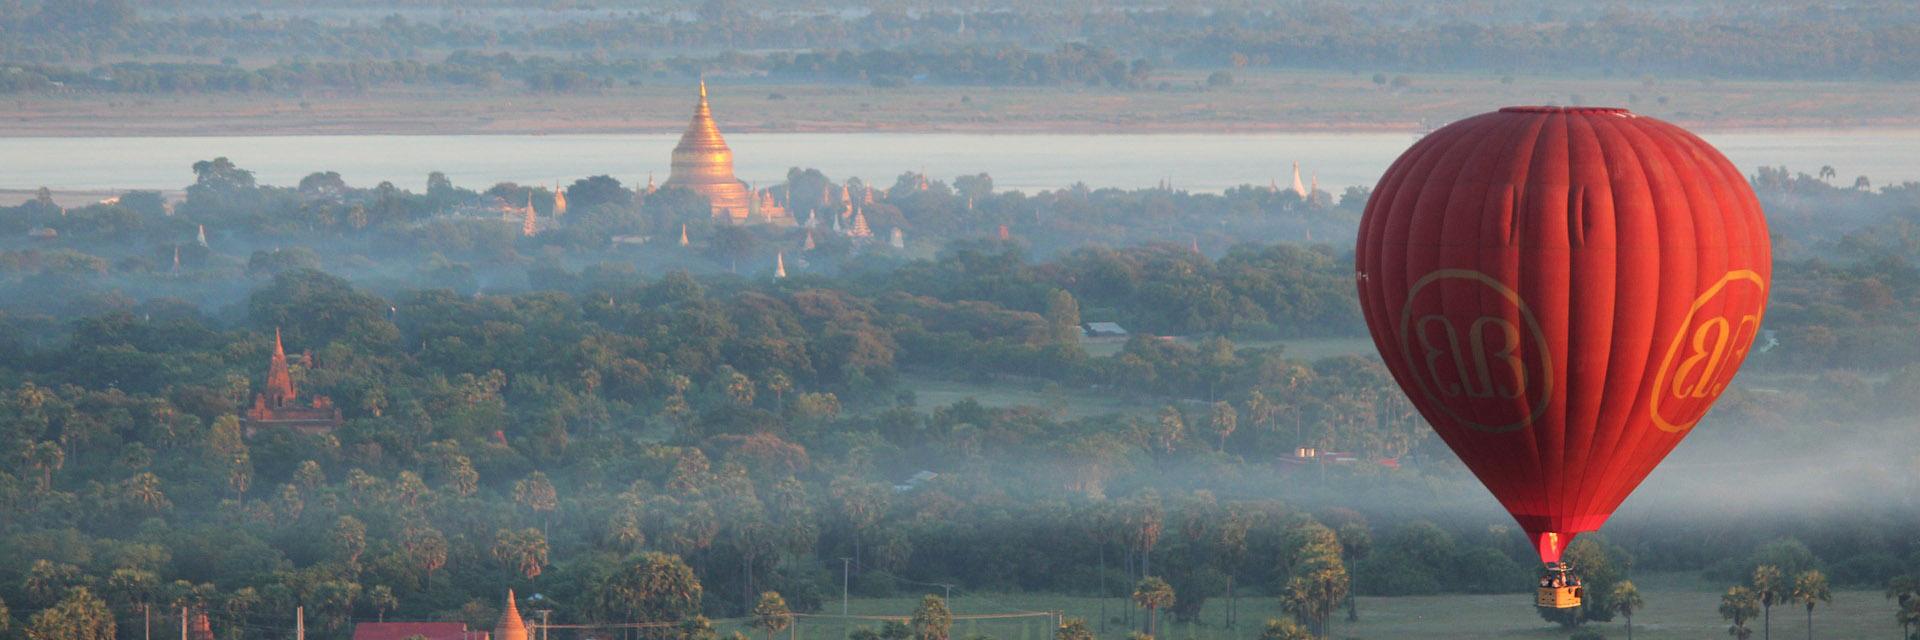 balloons-over-bagan-myanmar